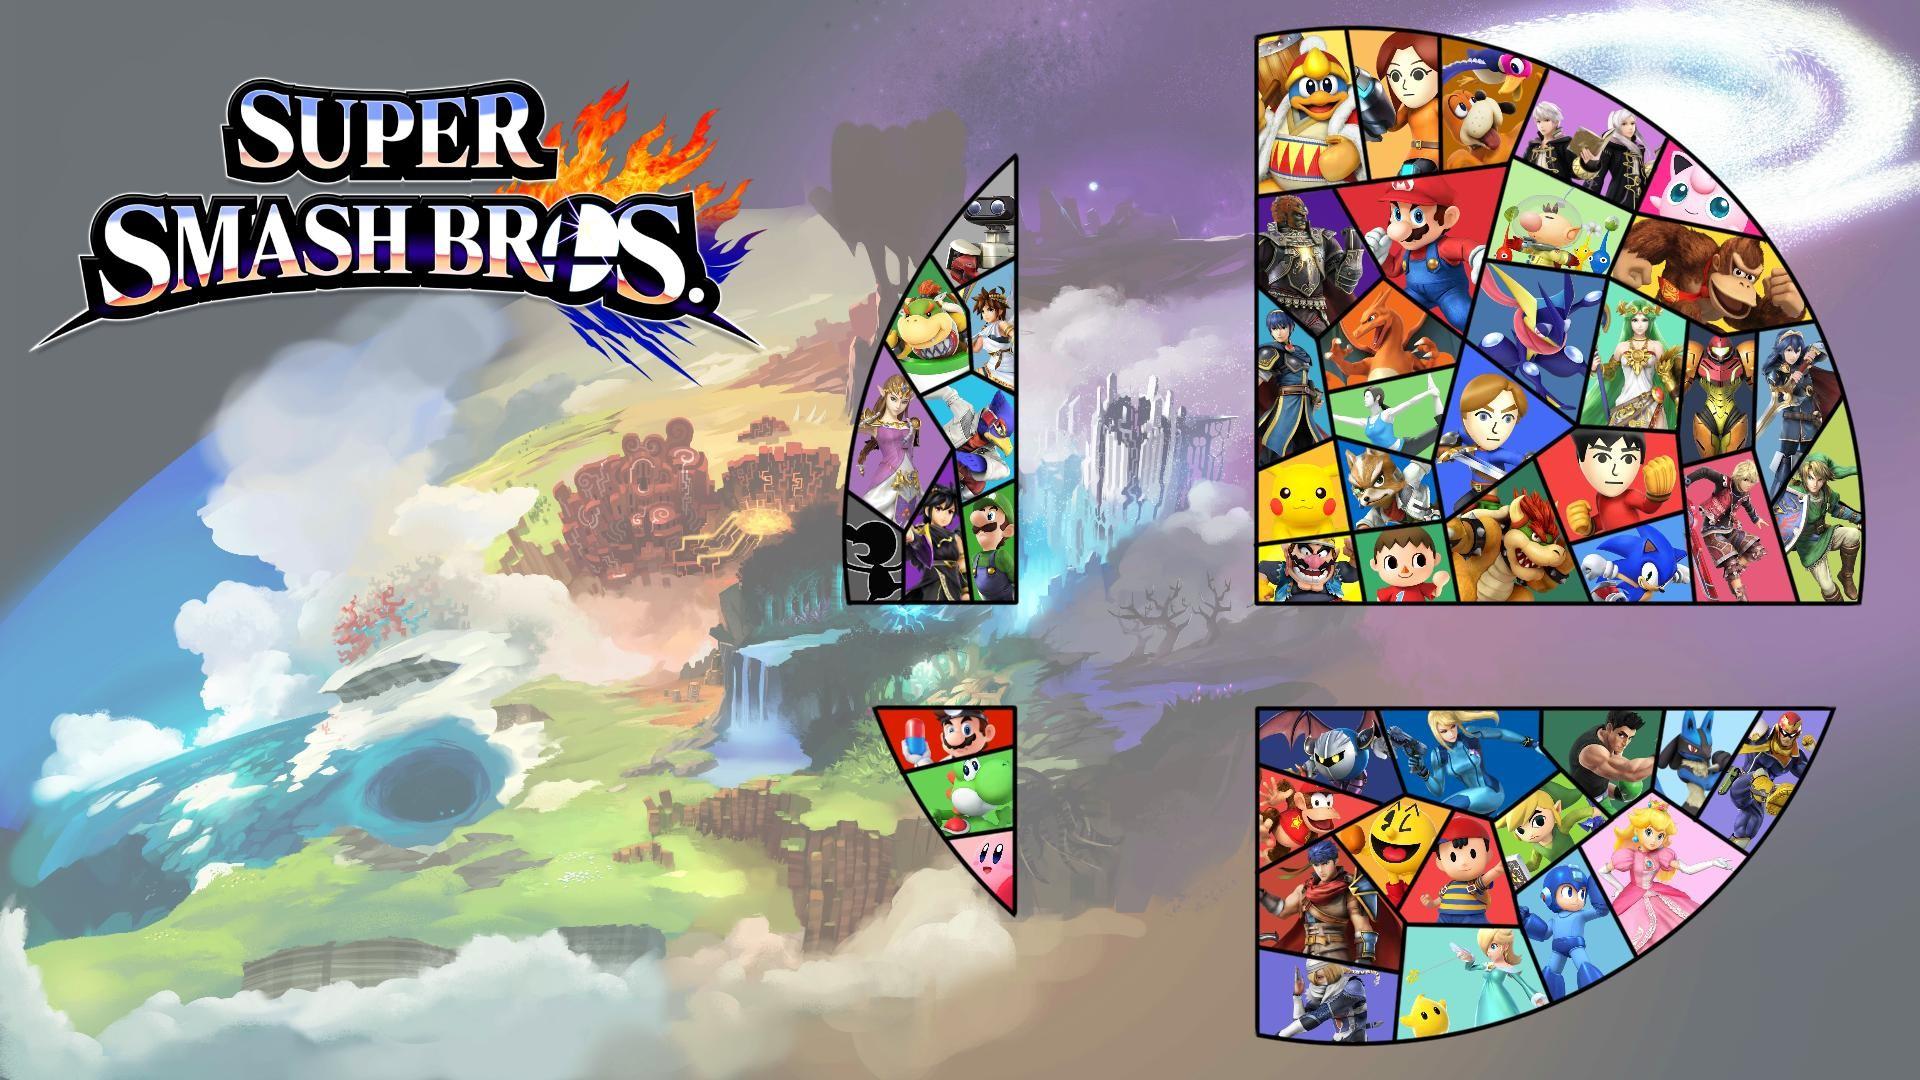 Super Smash Bros World Wallpaper